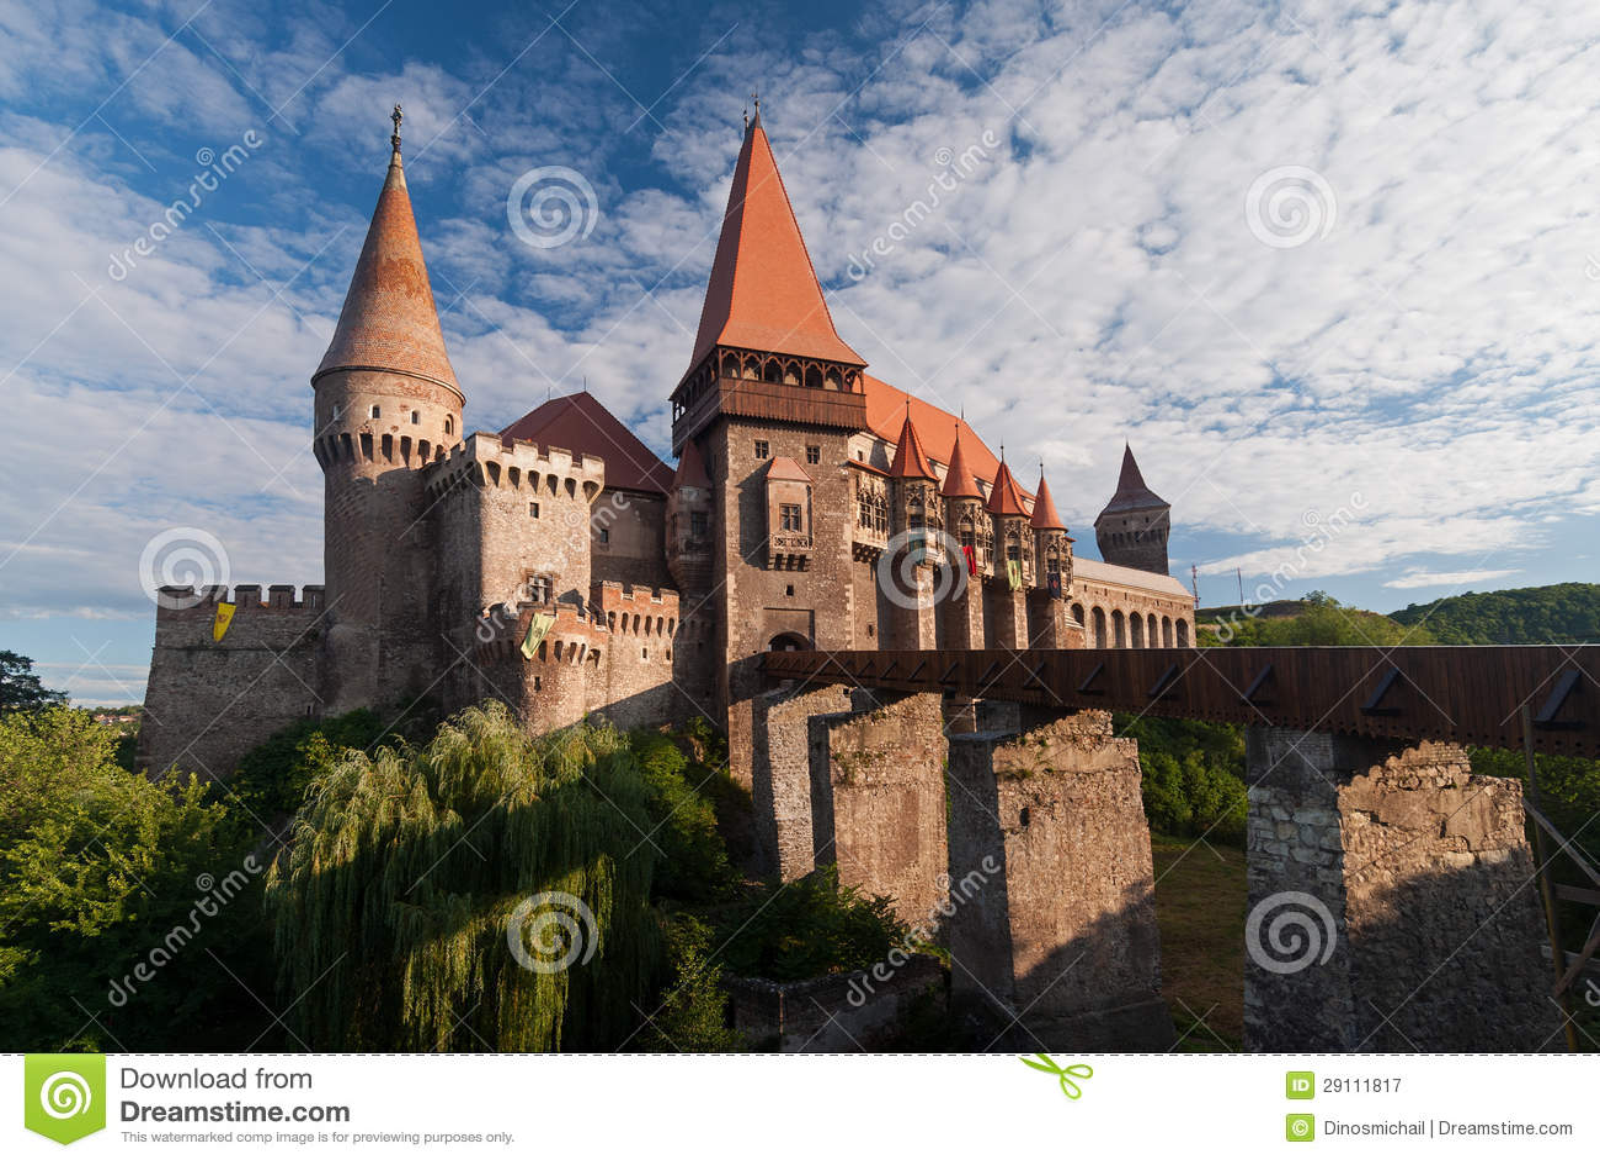 Castelo de Corvin, Romania